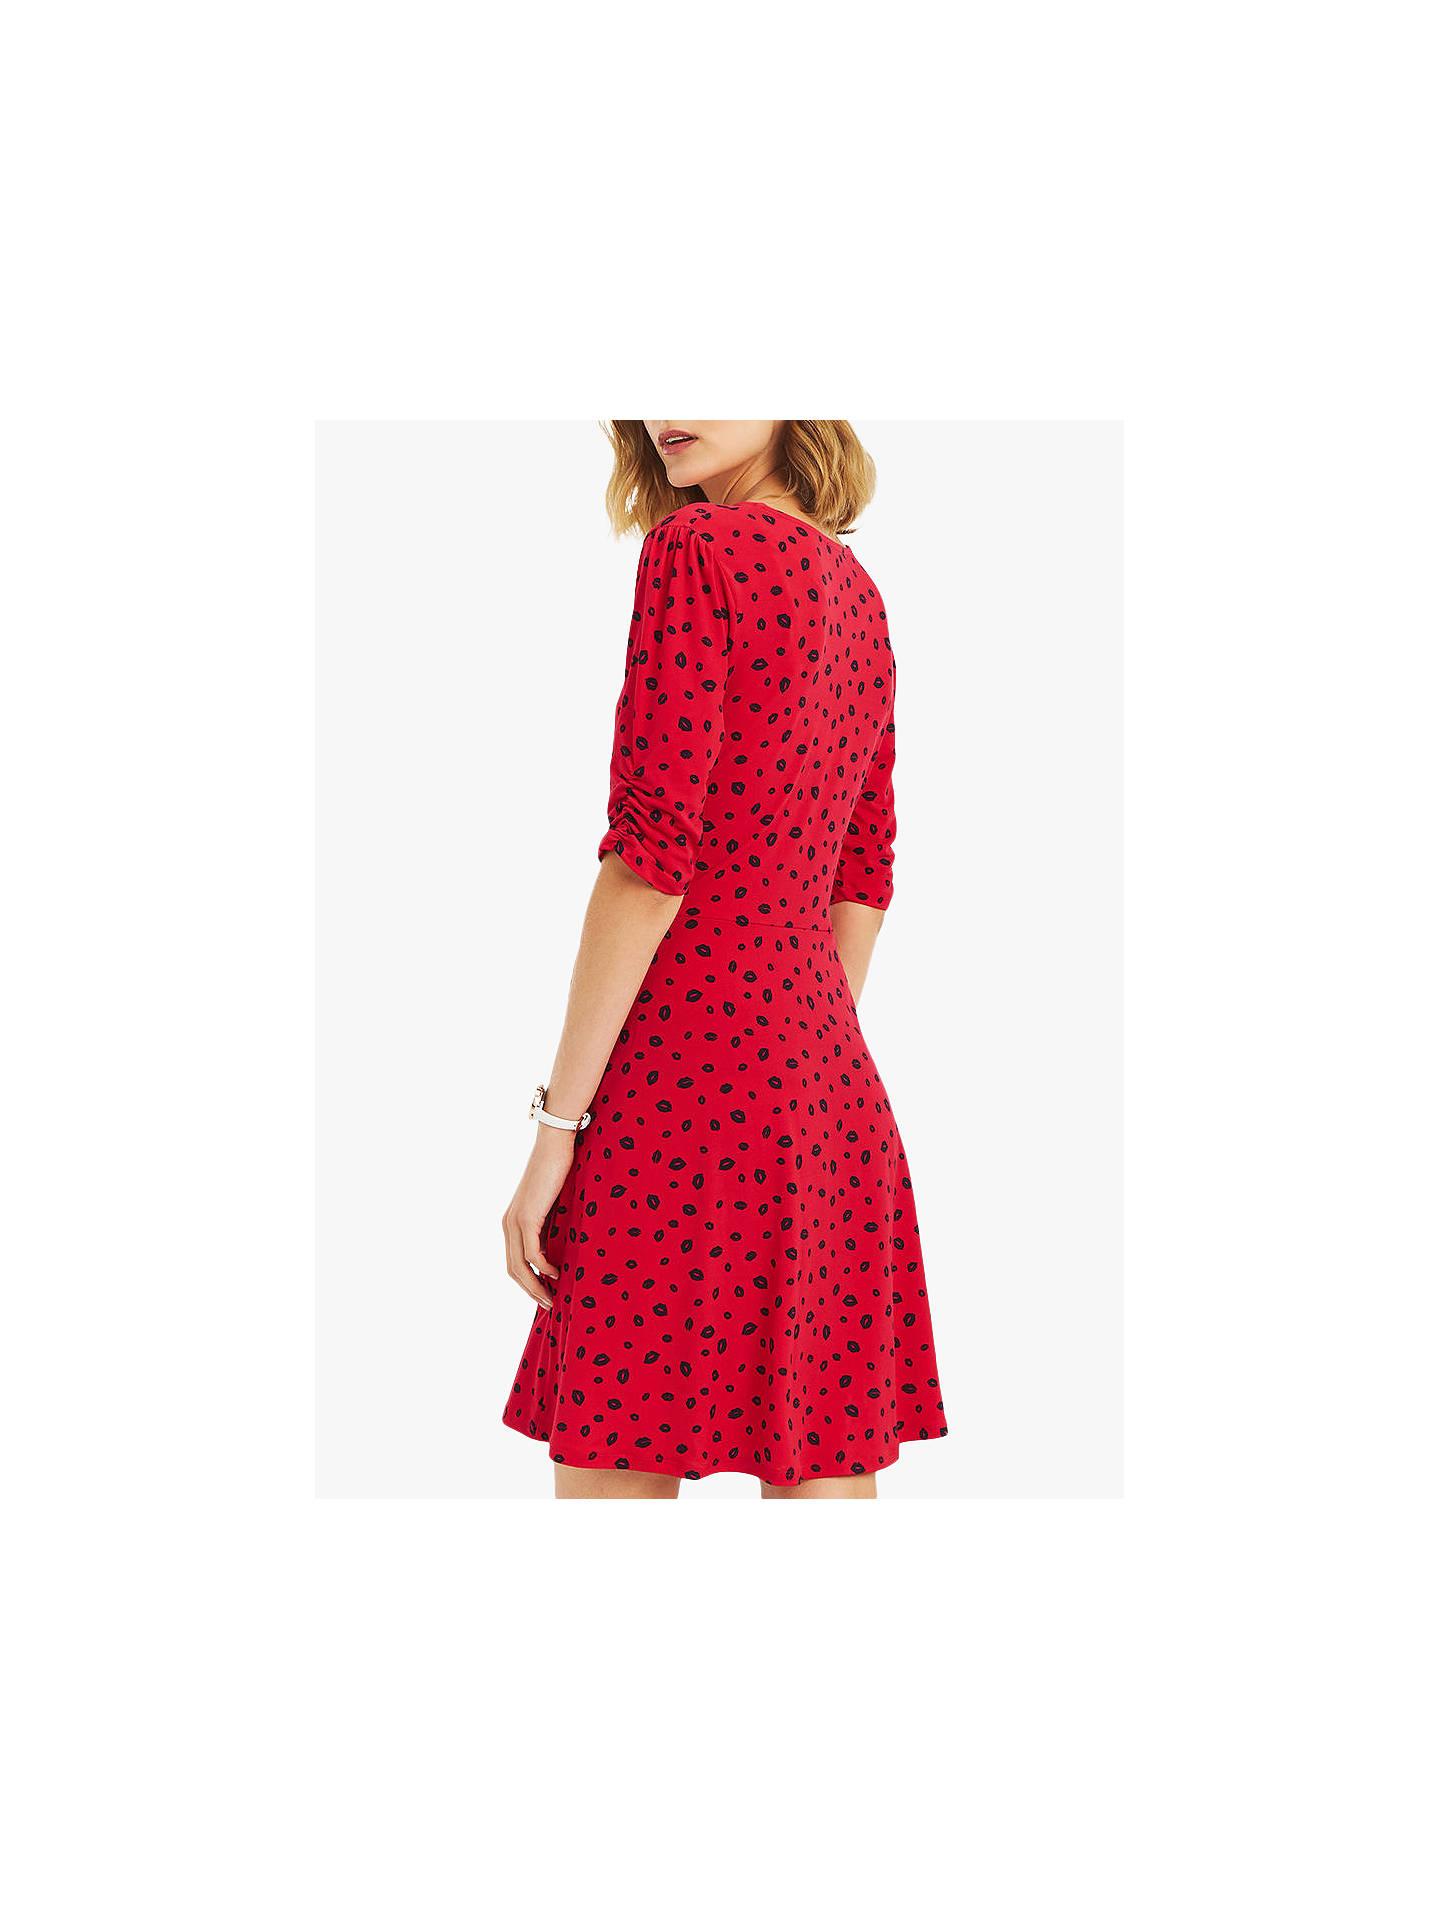 3fa0e2262d6 ... Buy Oasis Lip Print Ruffle Dress